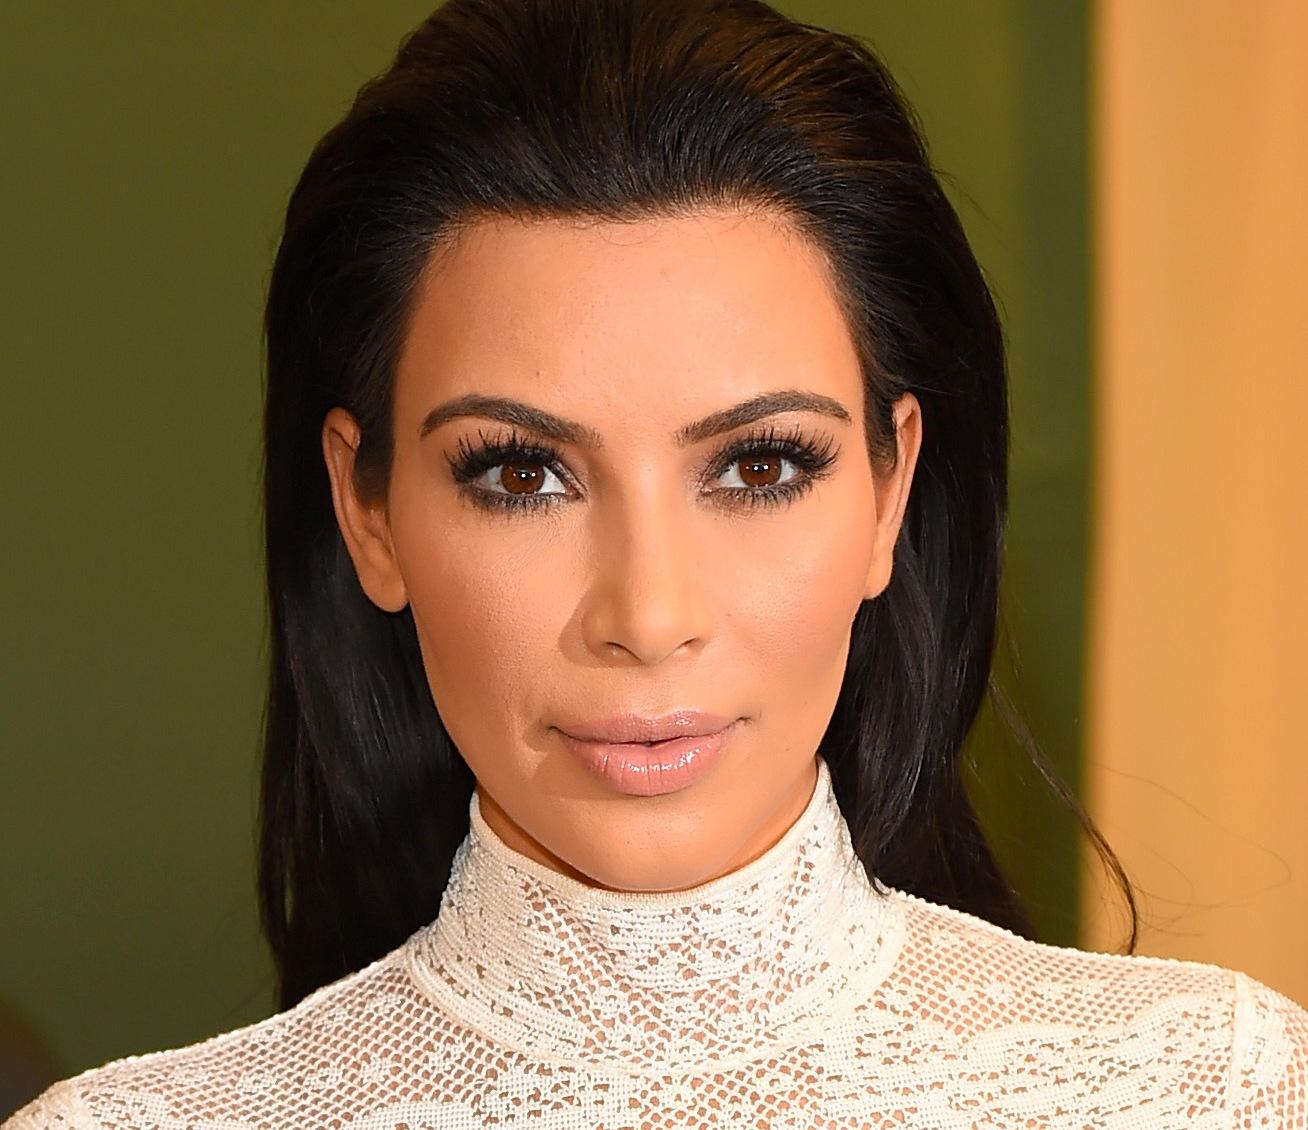 kim kardashian net worth - HD1308×1130